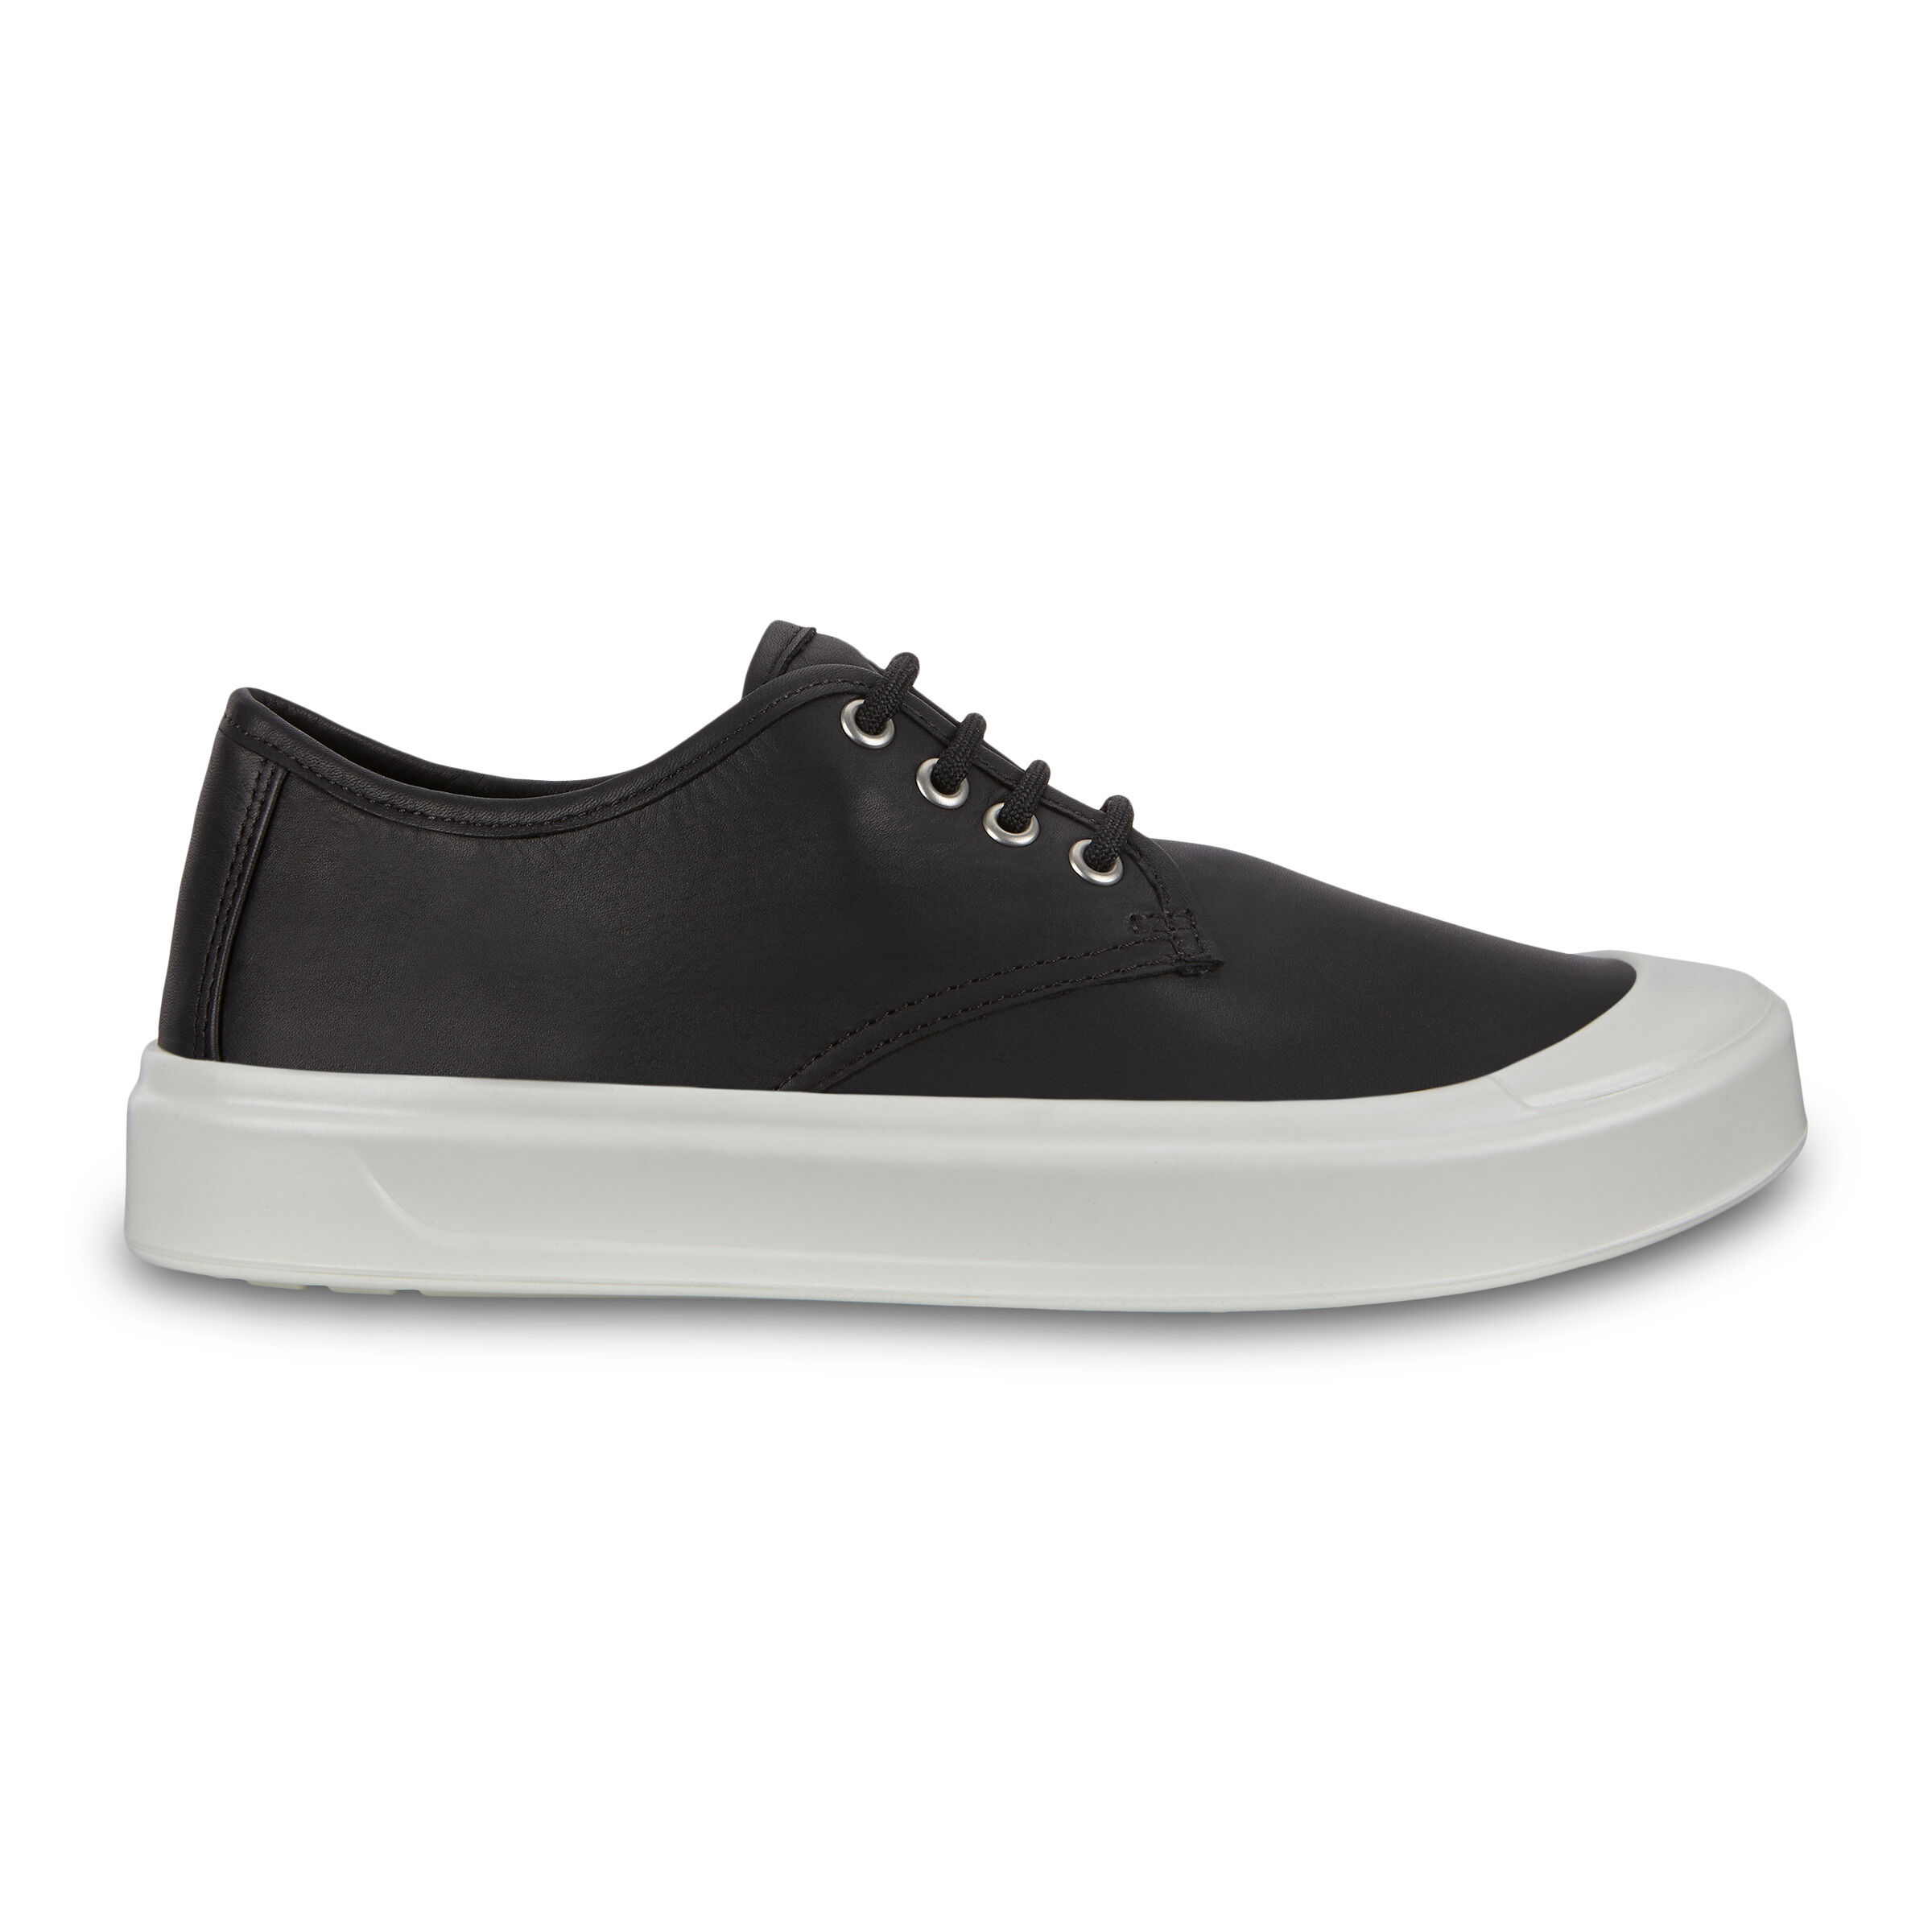 ECCO Flexure T-cap Womens Sneakers